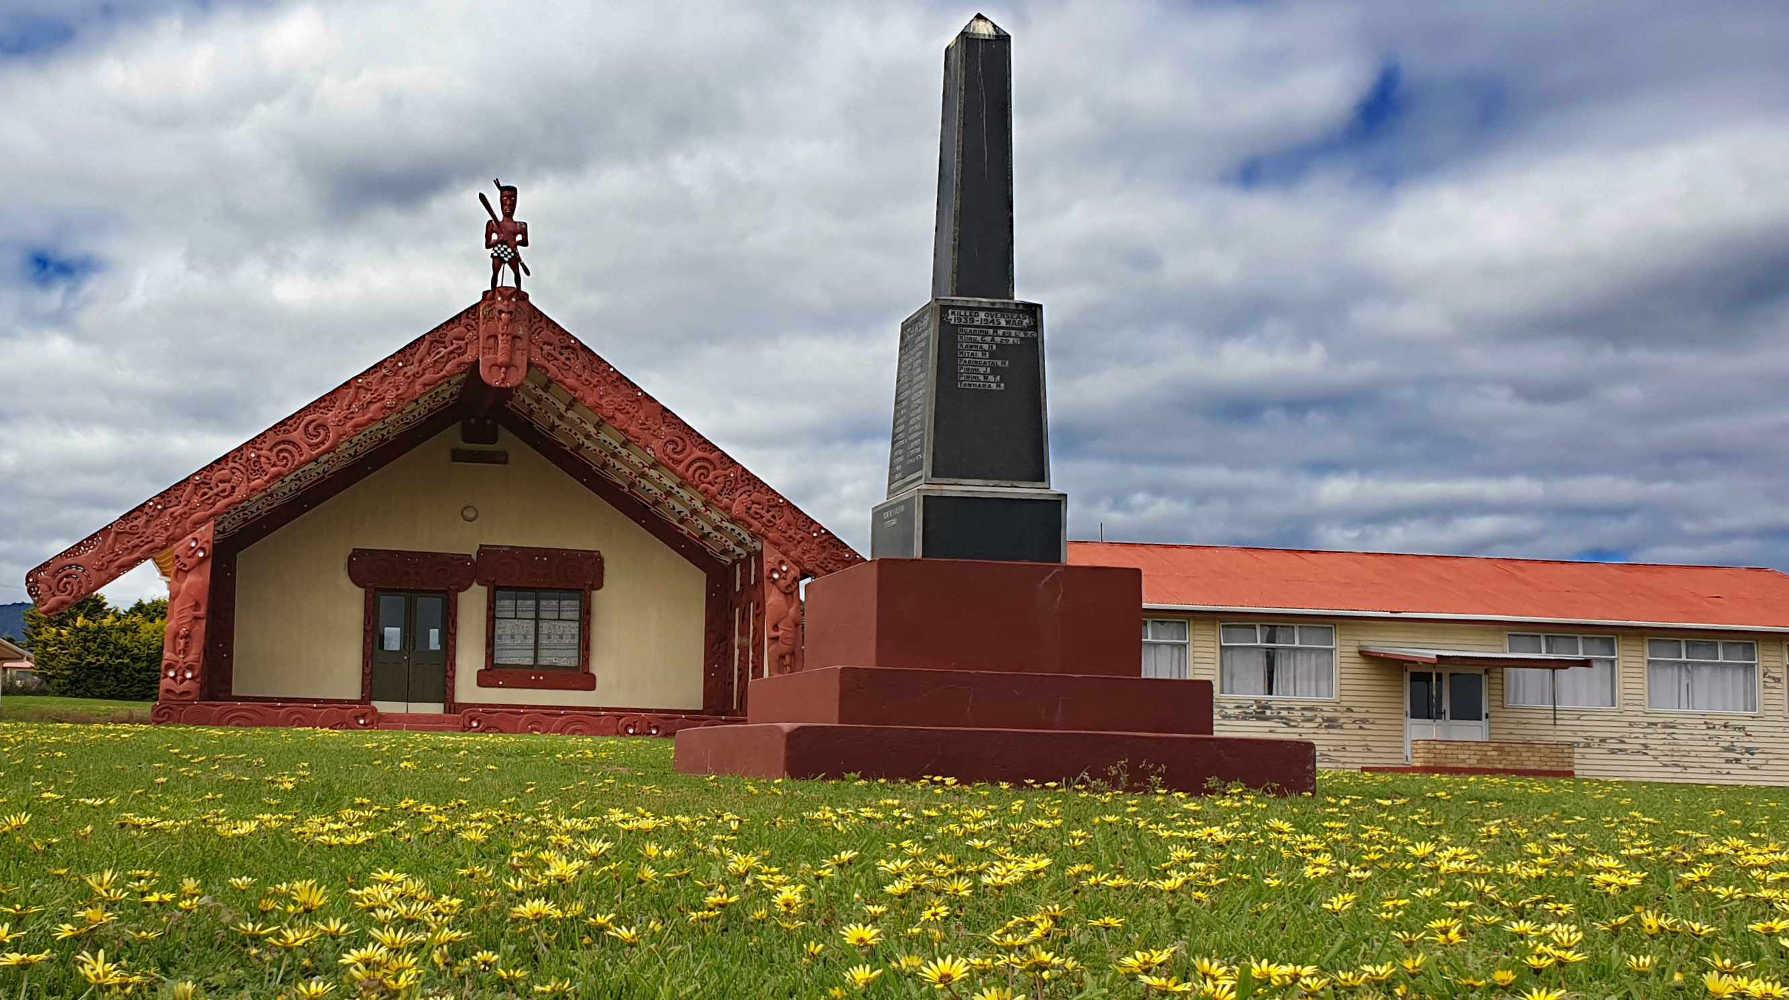 TE KAHA vicnity Marae with its military memorial,New Zealand